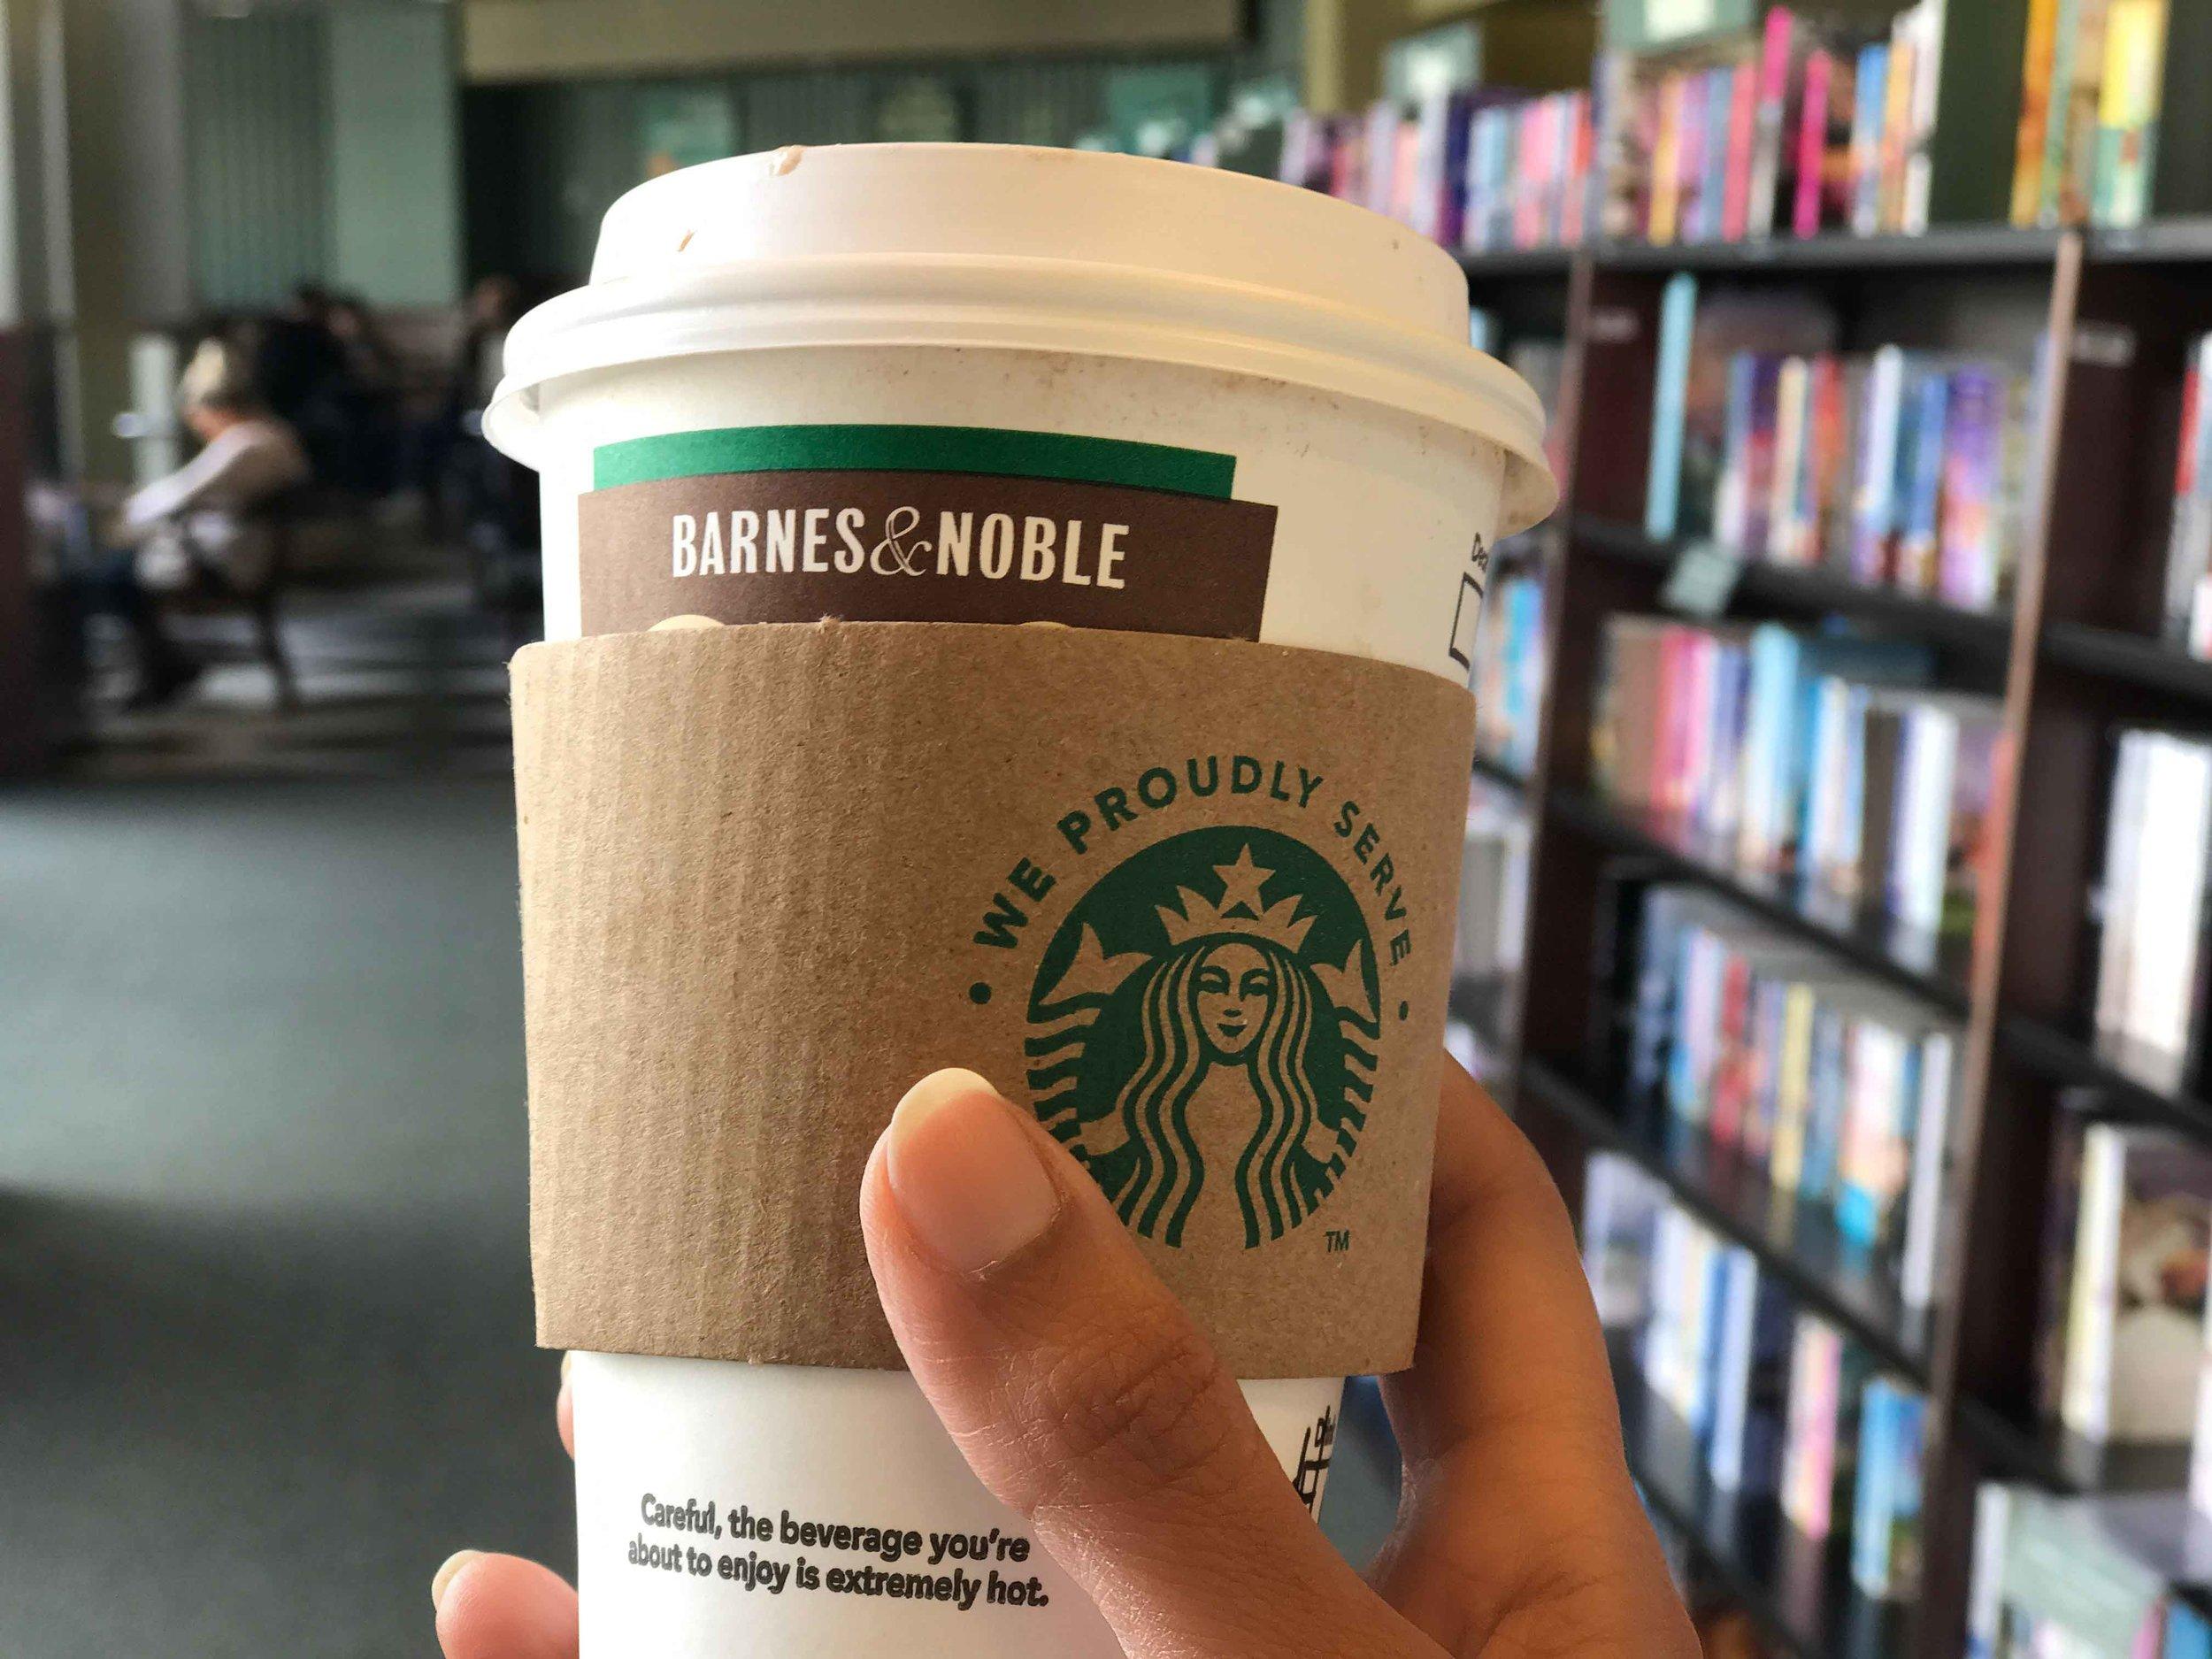 Starbucks coffee, Barns & Noble, The Grove, Los Angeles. Image©thingstodot.com